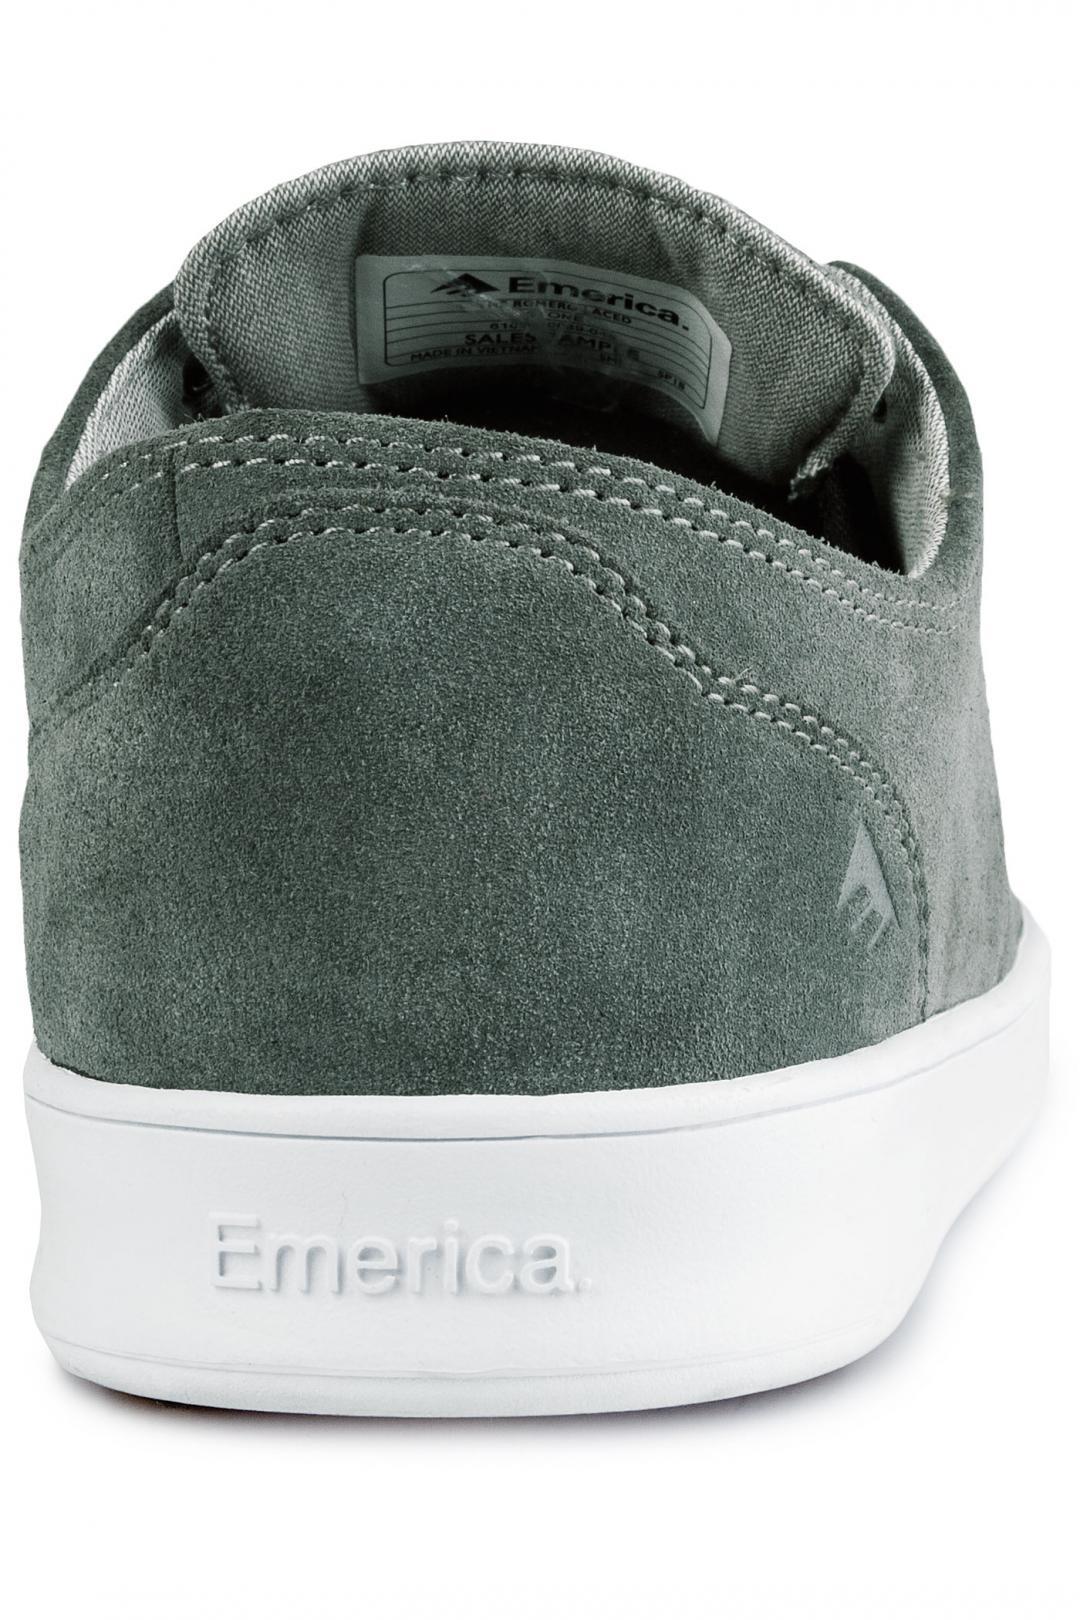 Uomo Emerica The Romero Laced stone | Sneakers low top